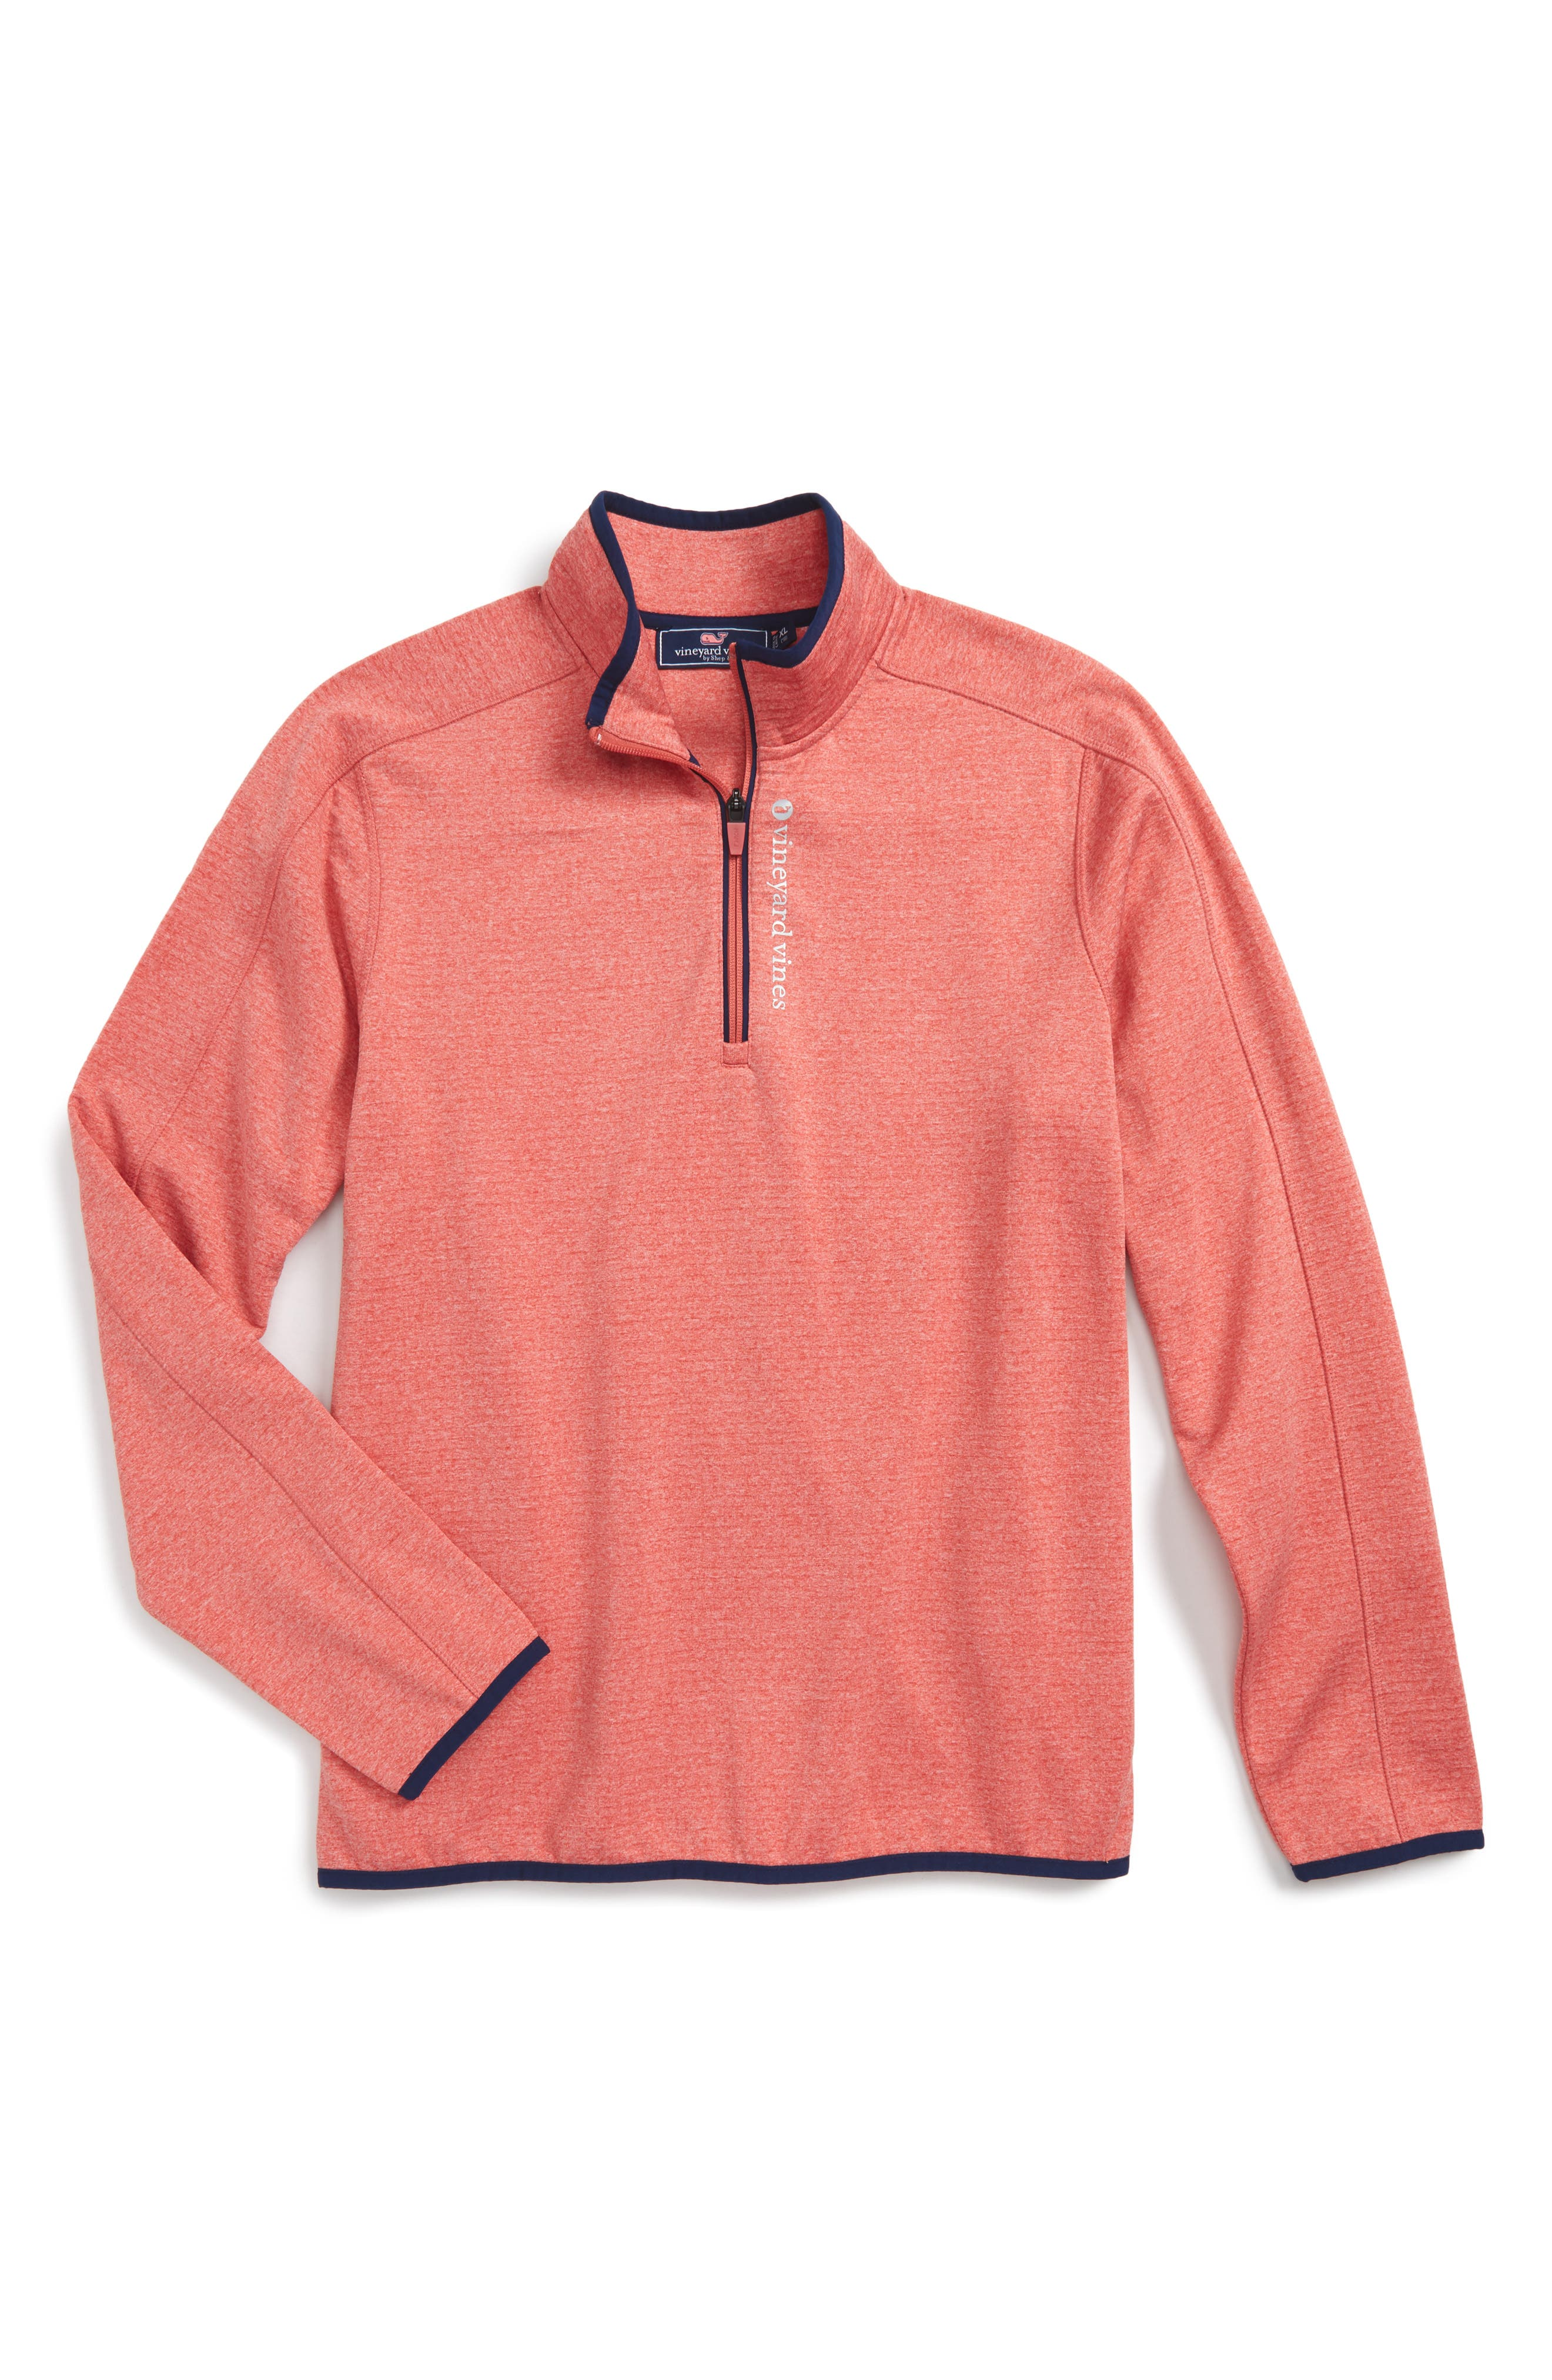 Vineyard Vines Grid Fleece Sweater (Toddler Boys, Little Boys & Big Boys)